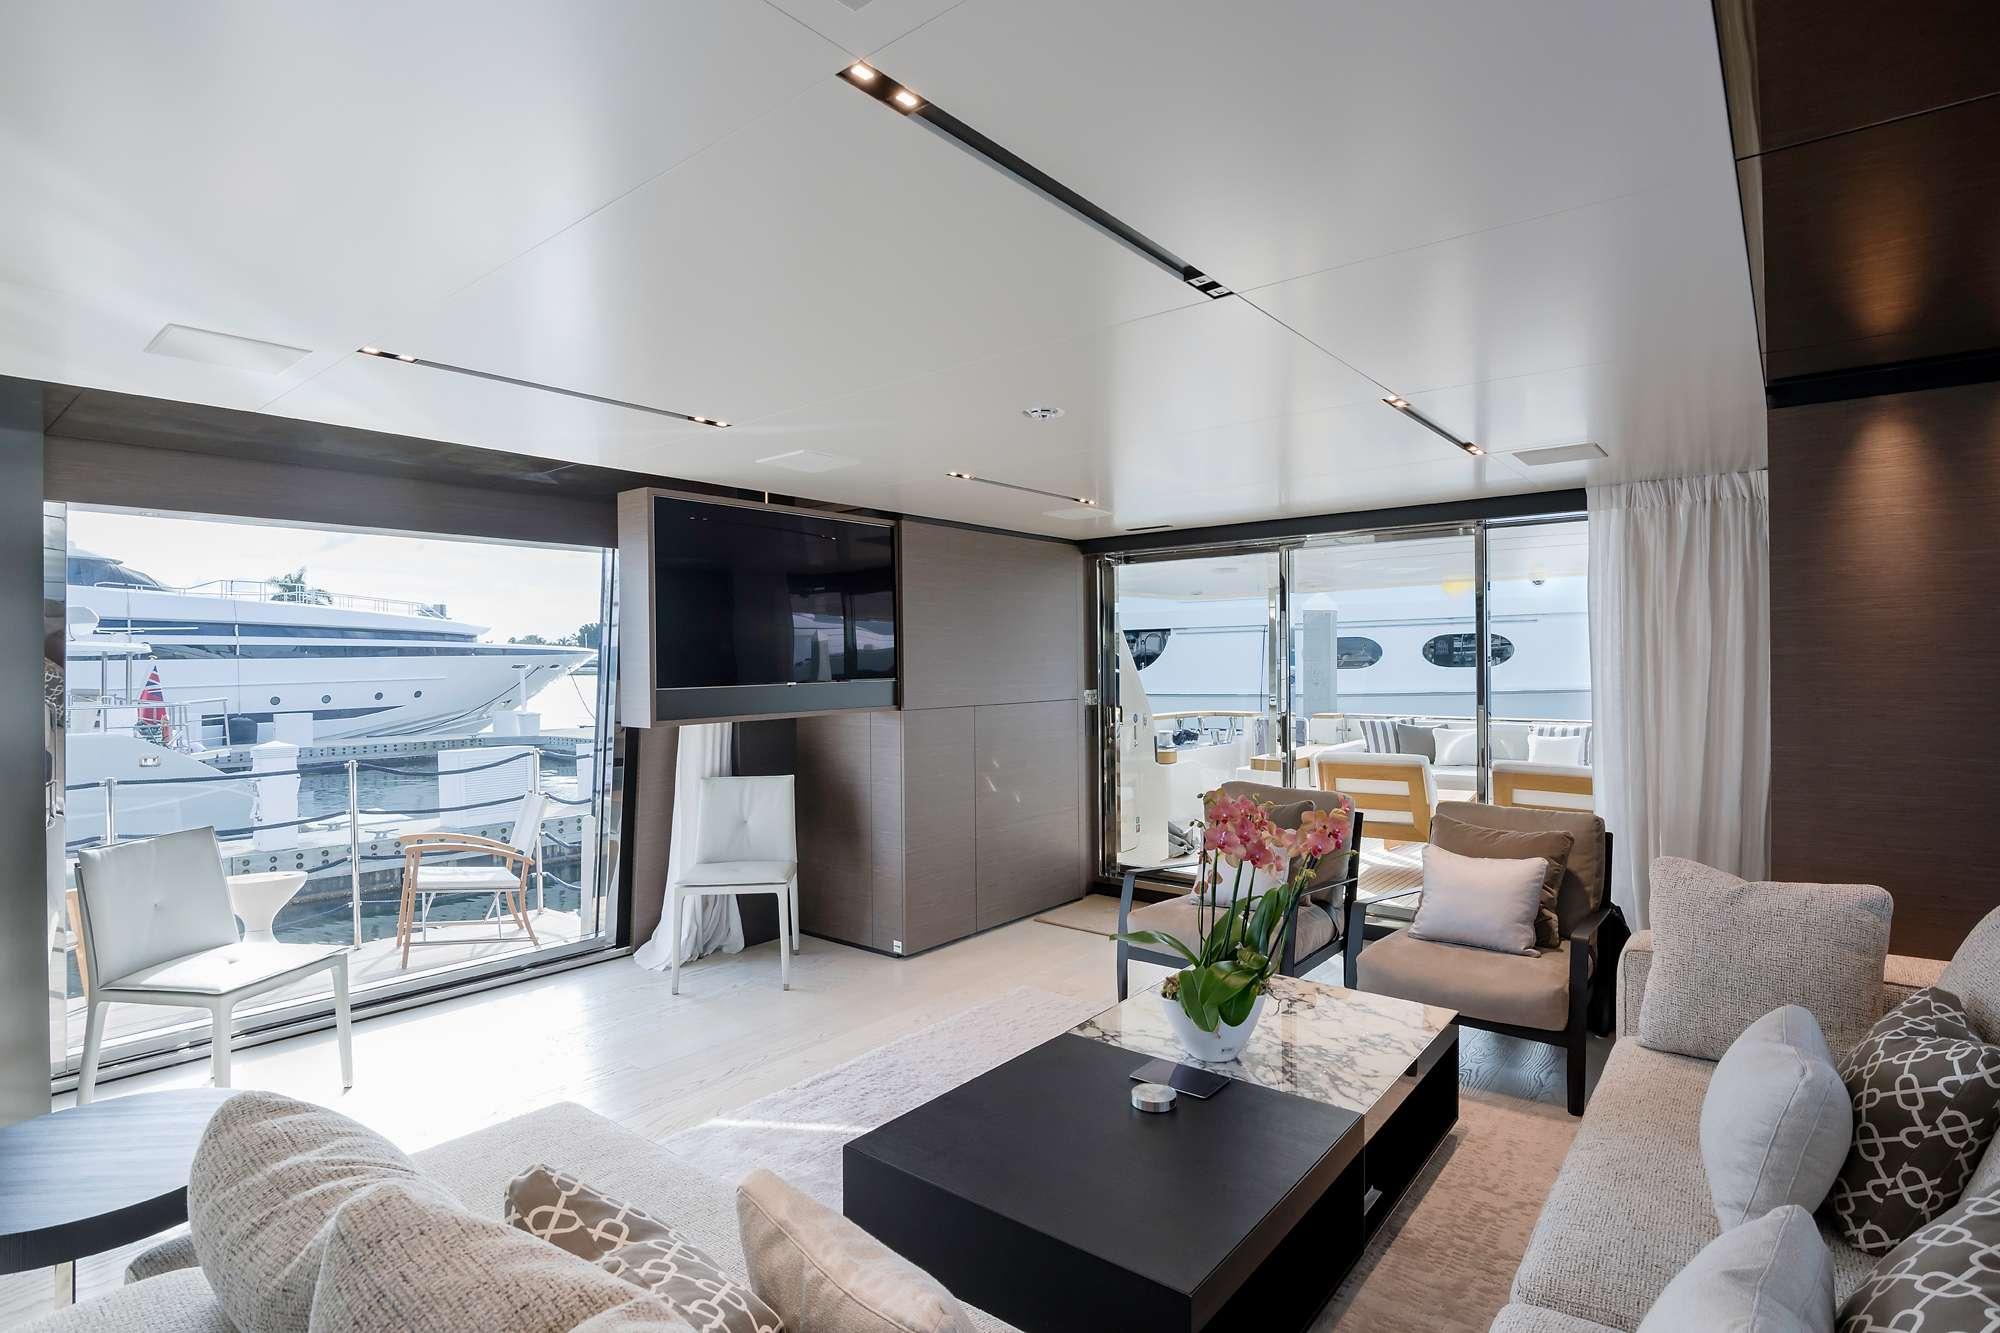 Salon with balcony